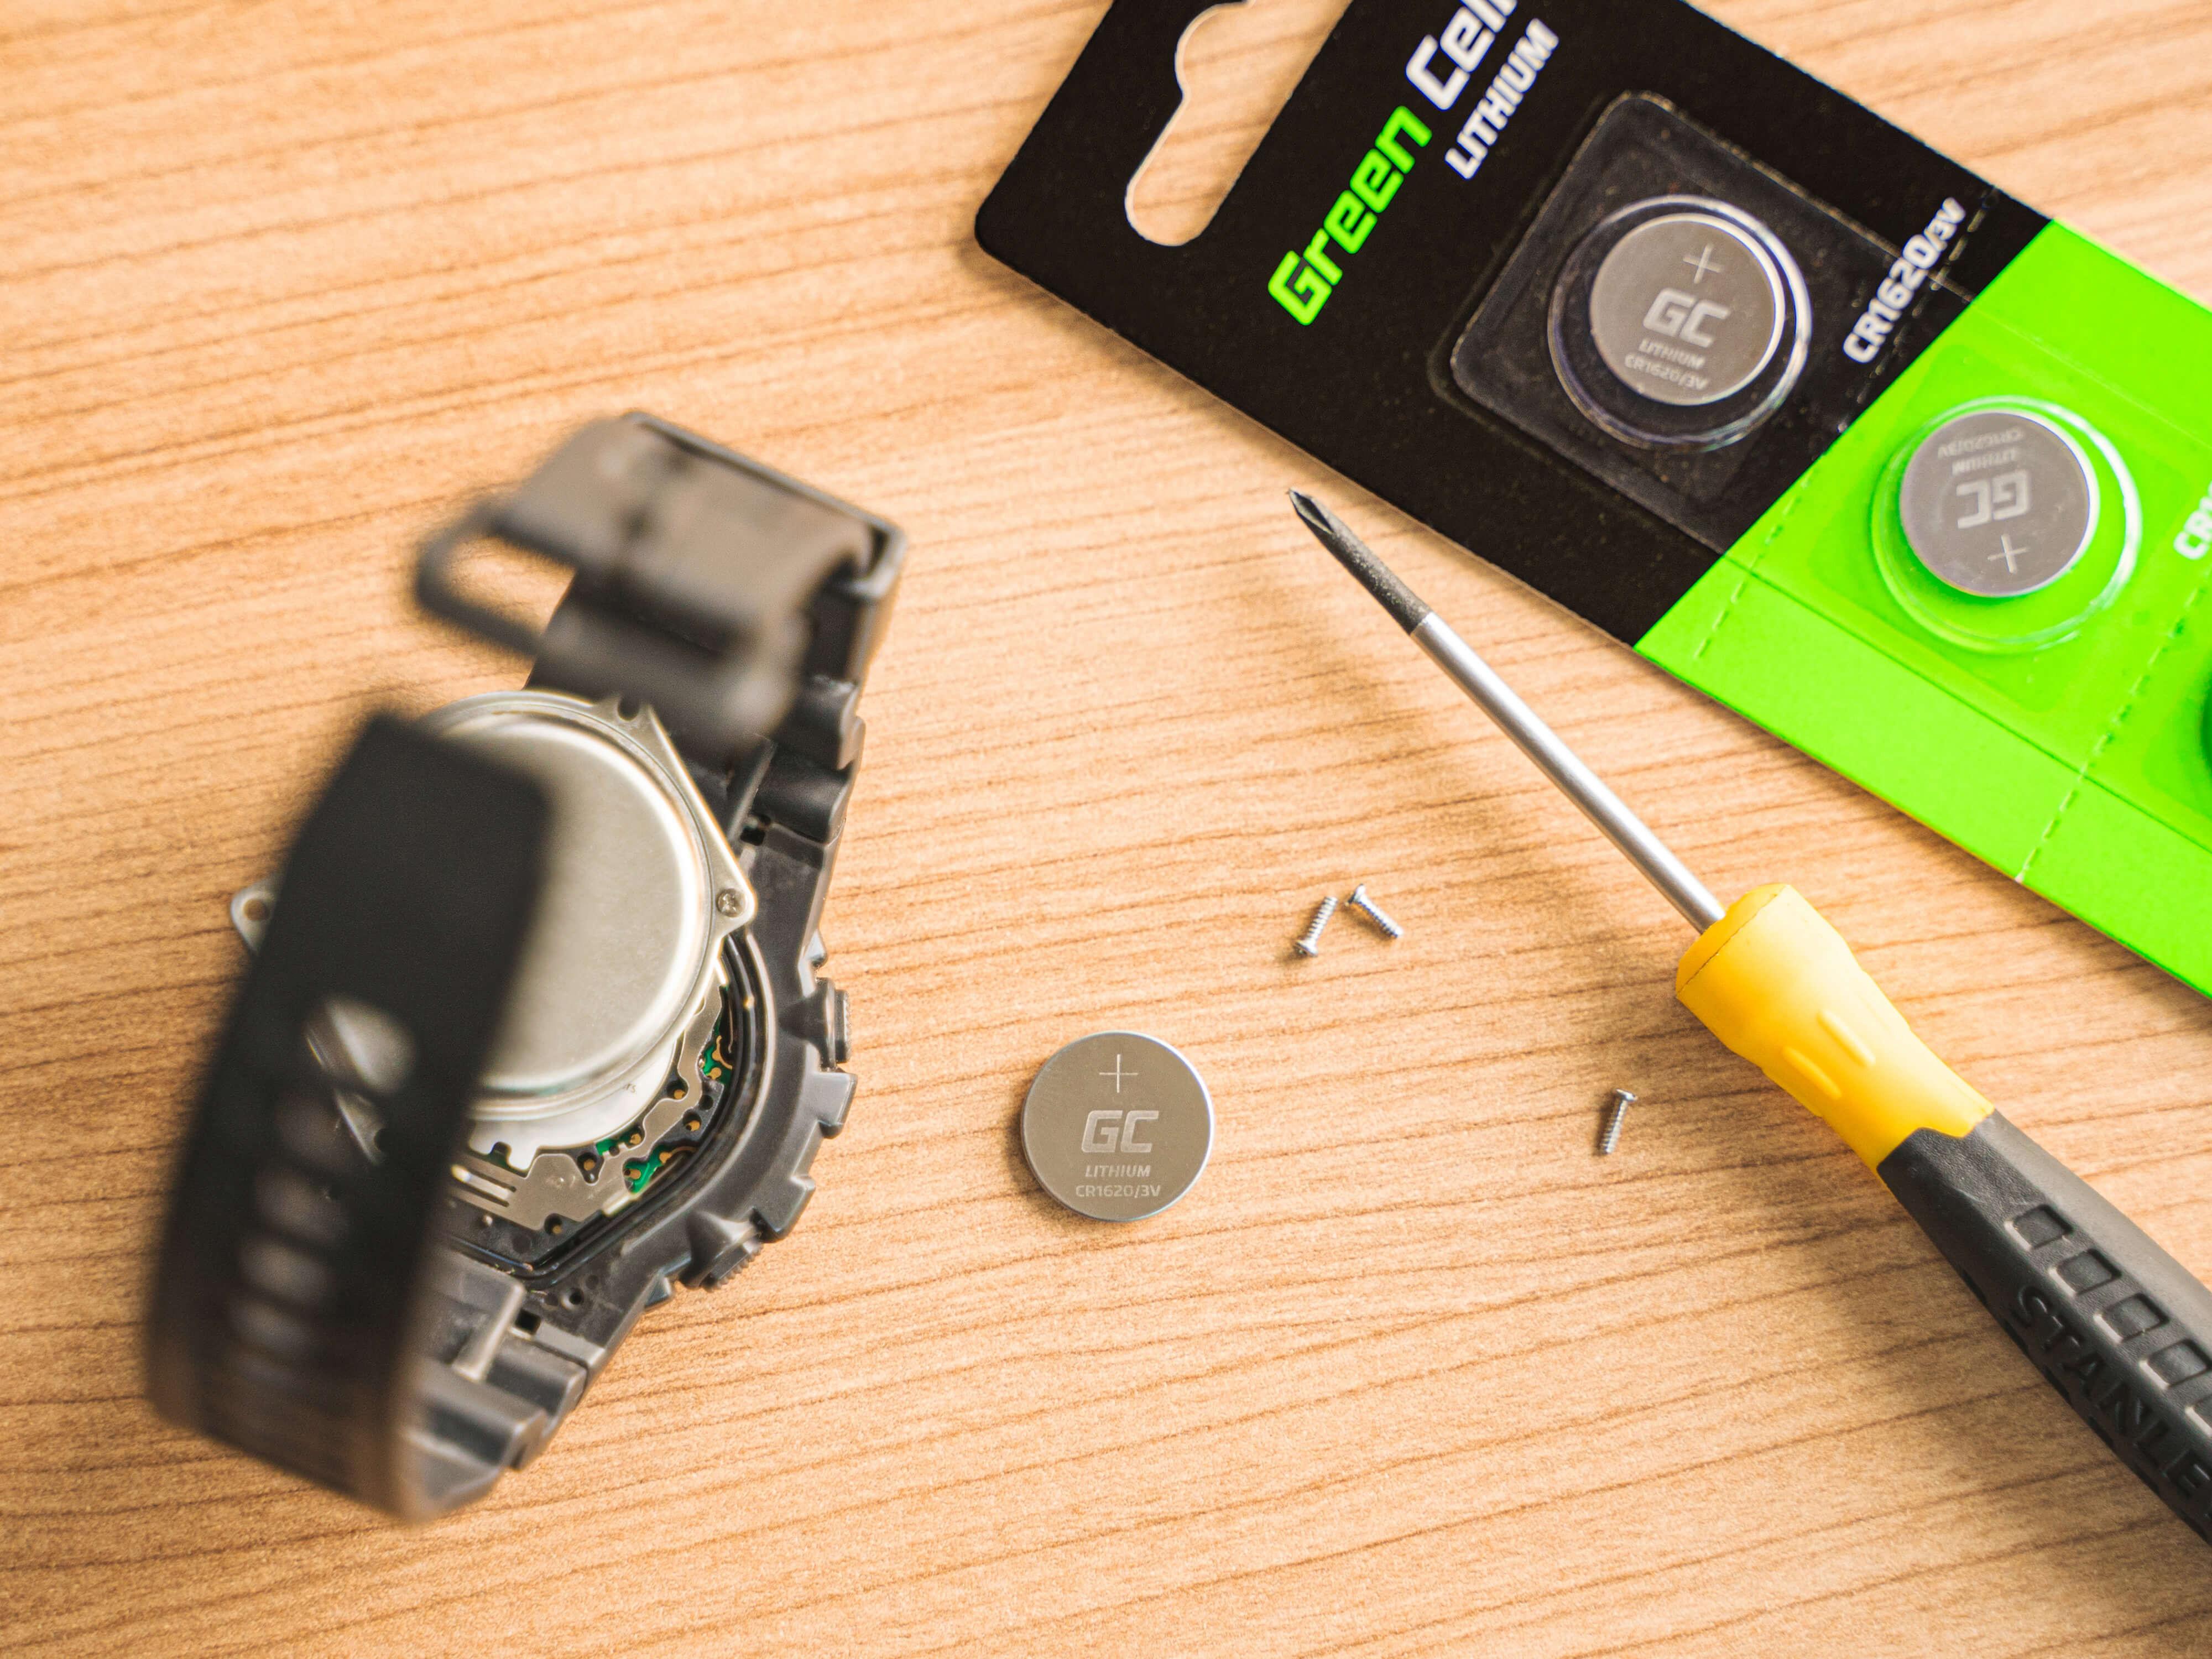 5x litium CR2025 3V 160mAh batterier